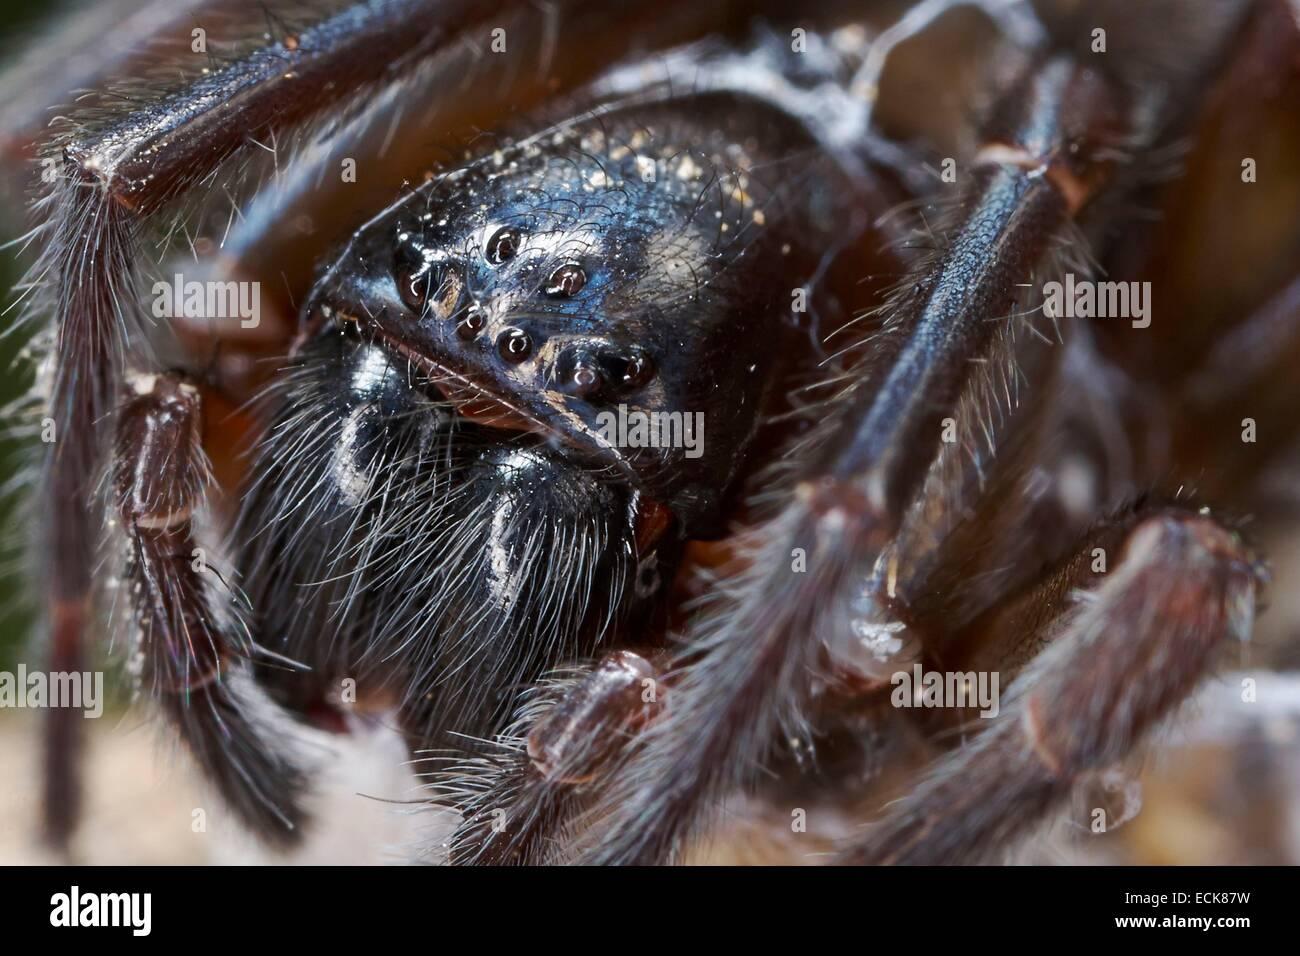 France, Araneae, Amaurobiidae, Spider, Black Lace-Weaver (Amaurobius ferox), portrait - Stock Image